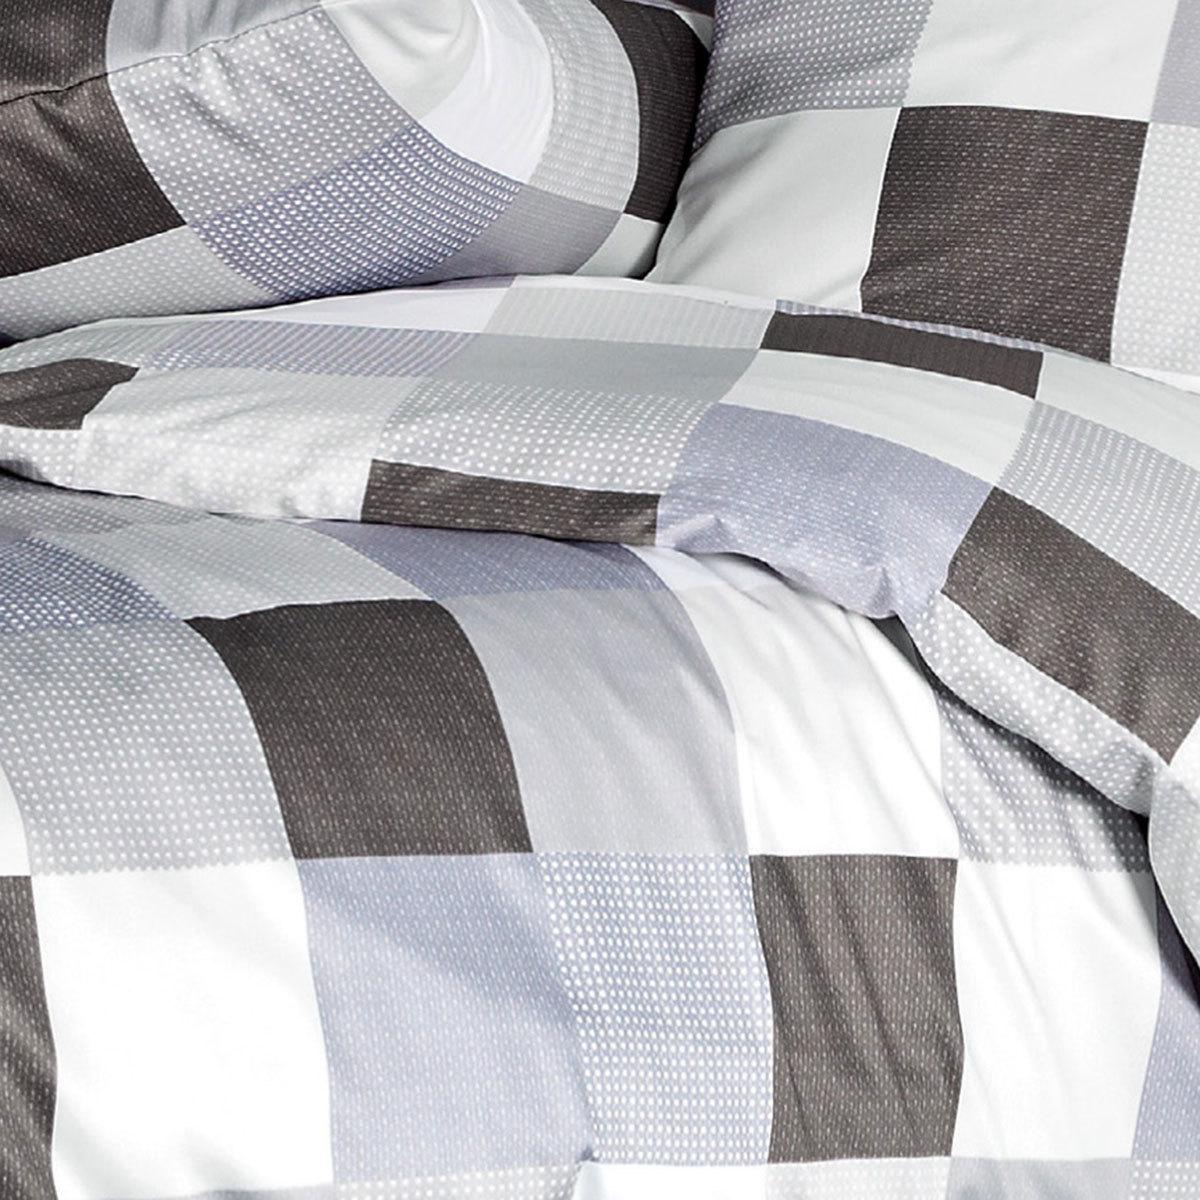 janine mako satin bettw sche moments 98025 08 g nstig online kaufen bei bettwaren shop. Black Bedroom Furniture Sets. Home Design Ideas